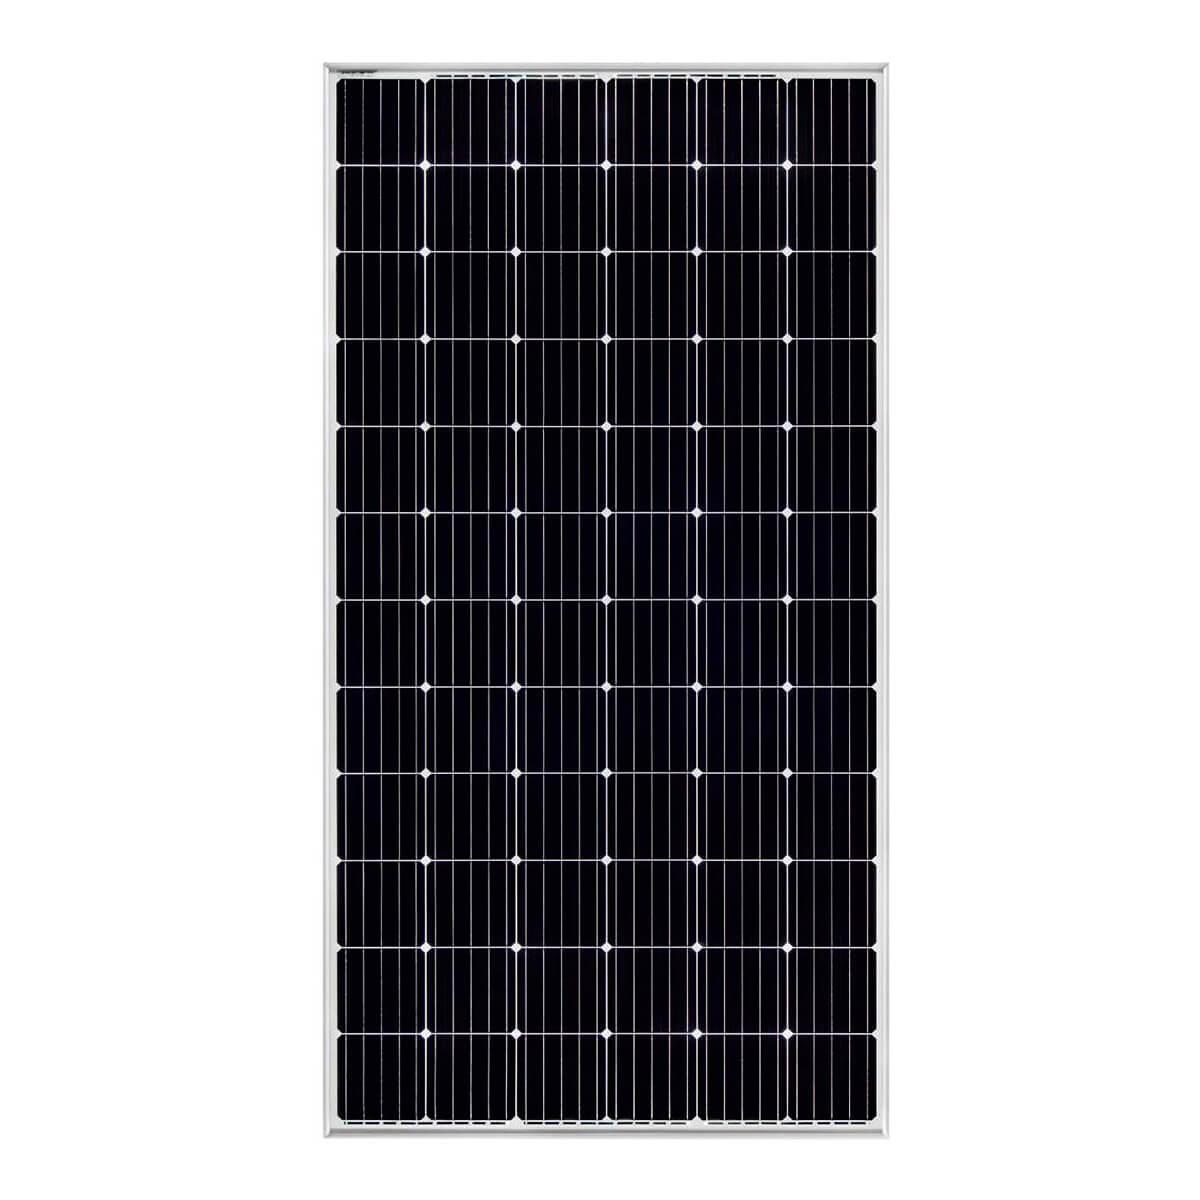 Odul solar 360W panel, odul solar 360Watt panel, Odul solar 360 W panel, odul solar 360 Watt panel, odul solar 360 Watt monokristal panel, Odul solar 360 W watt gunes paneli, odul solar 360 W watt monokristal gunes paneli, odul solar 360 W Watt fotovoltaik monokristal solar panel, odul solar 360W monokristal gunes enerjisi, odul solar OSM72-360W panel, ÖDÜL SOLAR 360 WATT